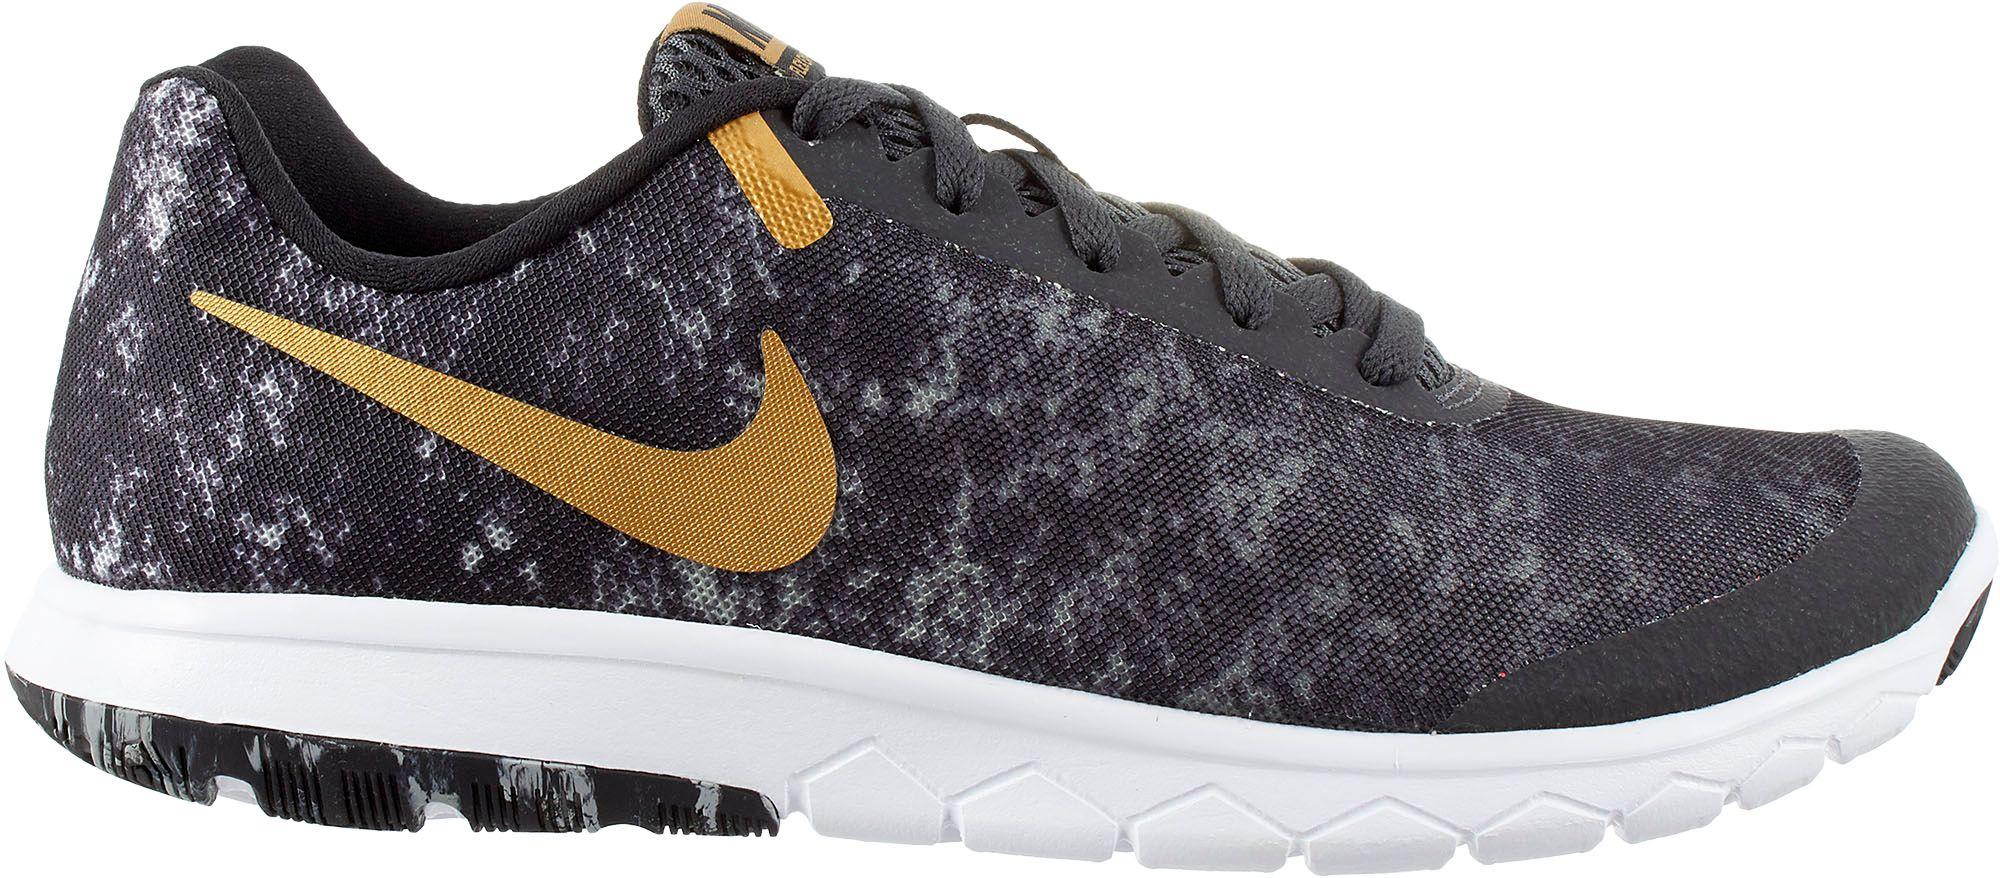 Nike Women's Flex Experience RN 6 Premium Running Shoes | DICK'S Sporting  Goods